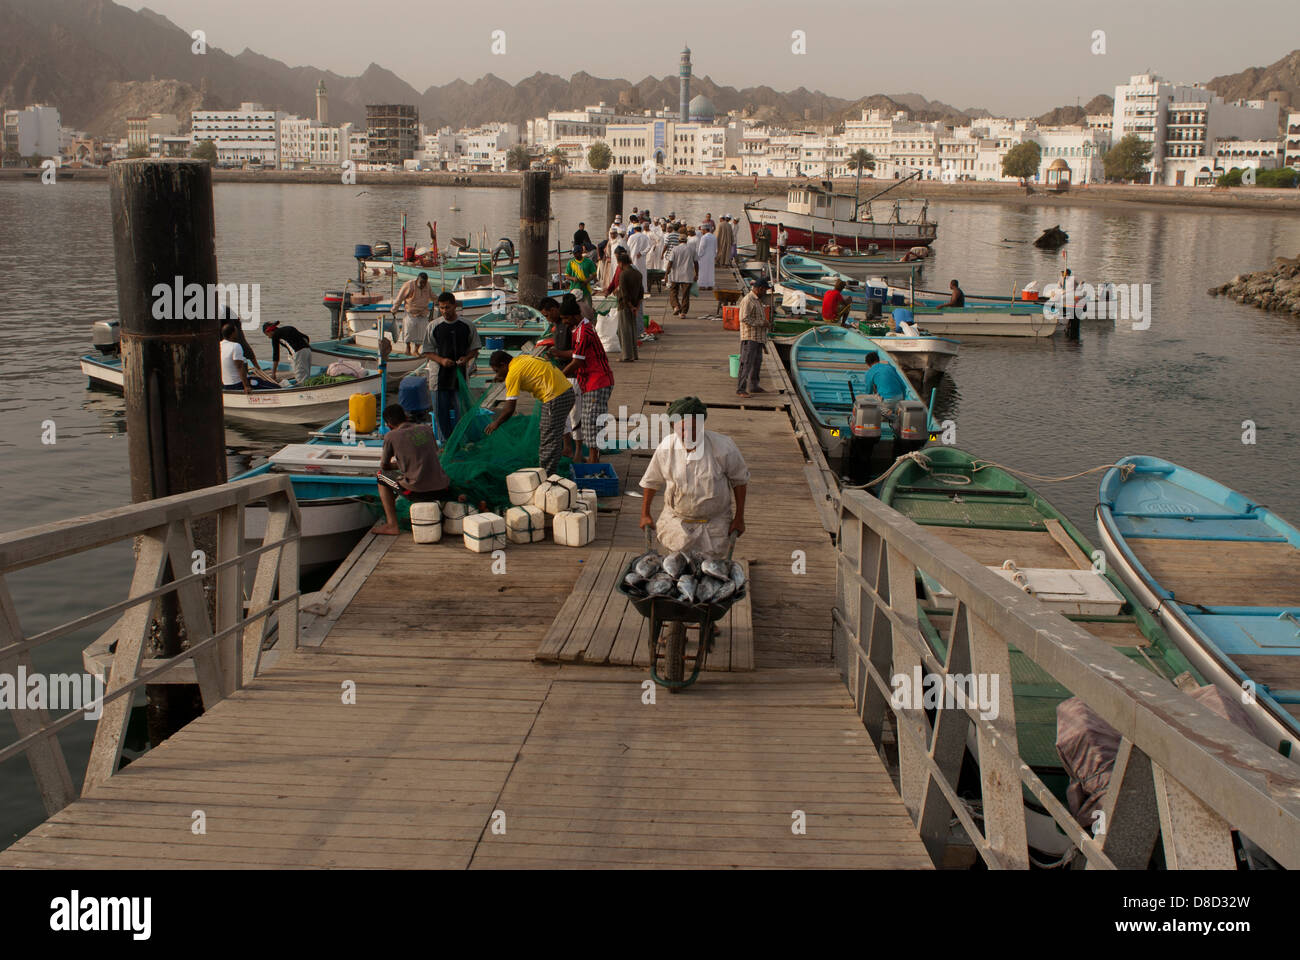 Fish pier, Muscat, Oman - Stock Image